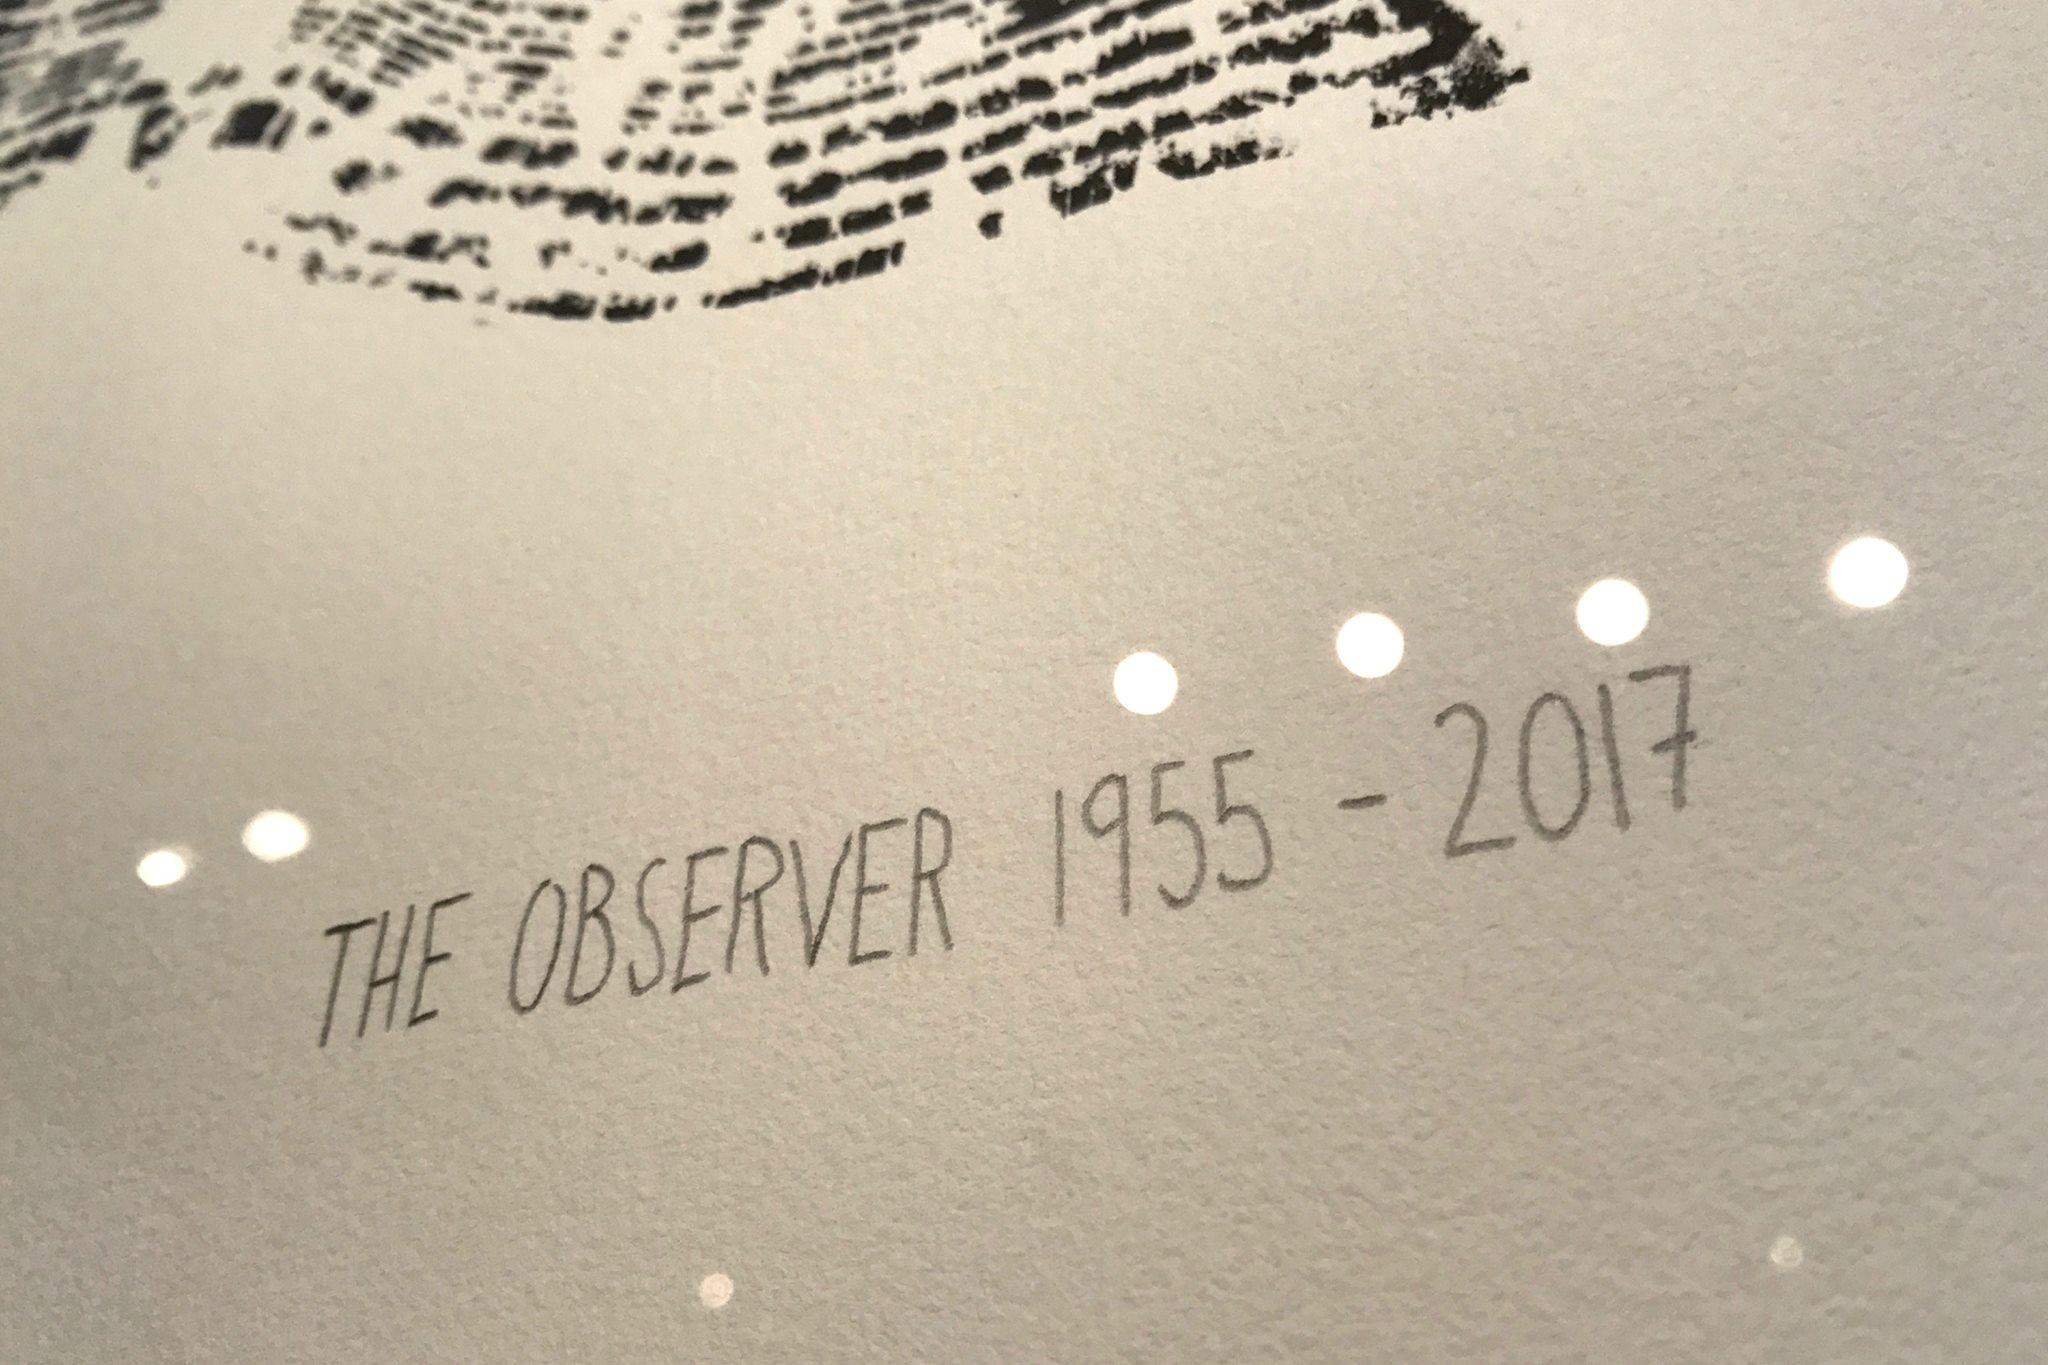 Alternative image for The Observer 1955-2017